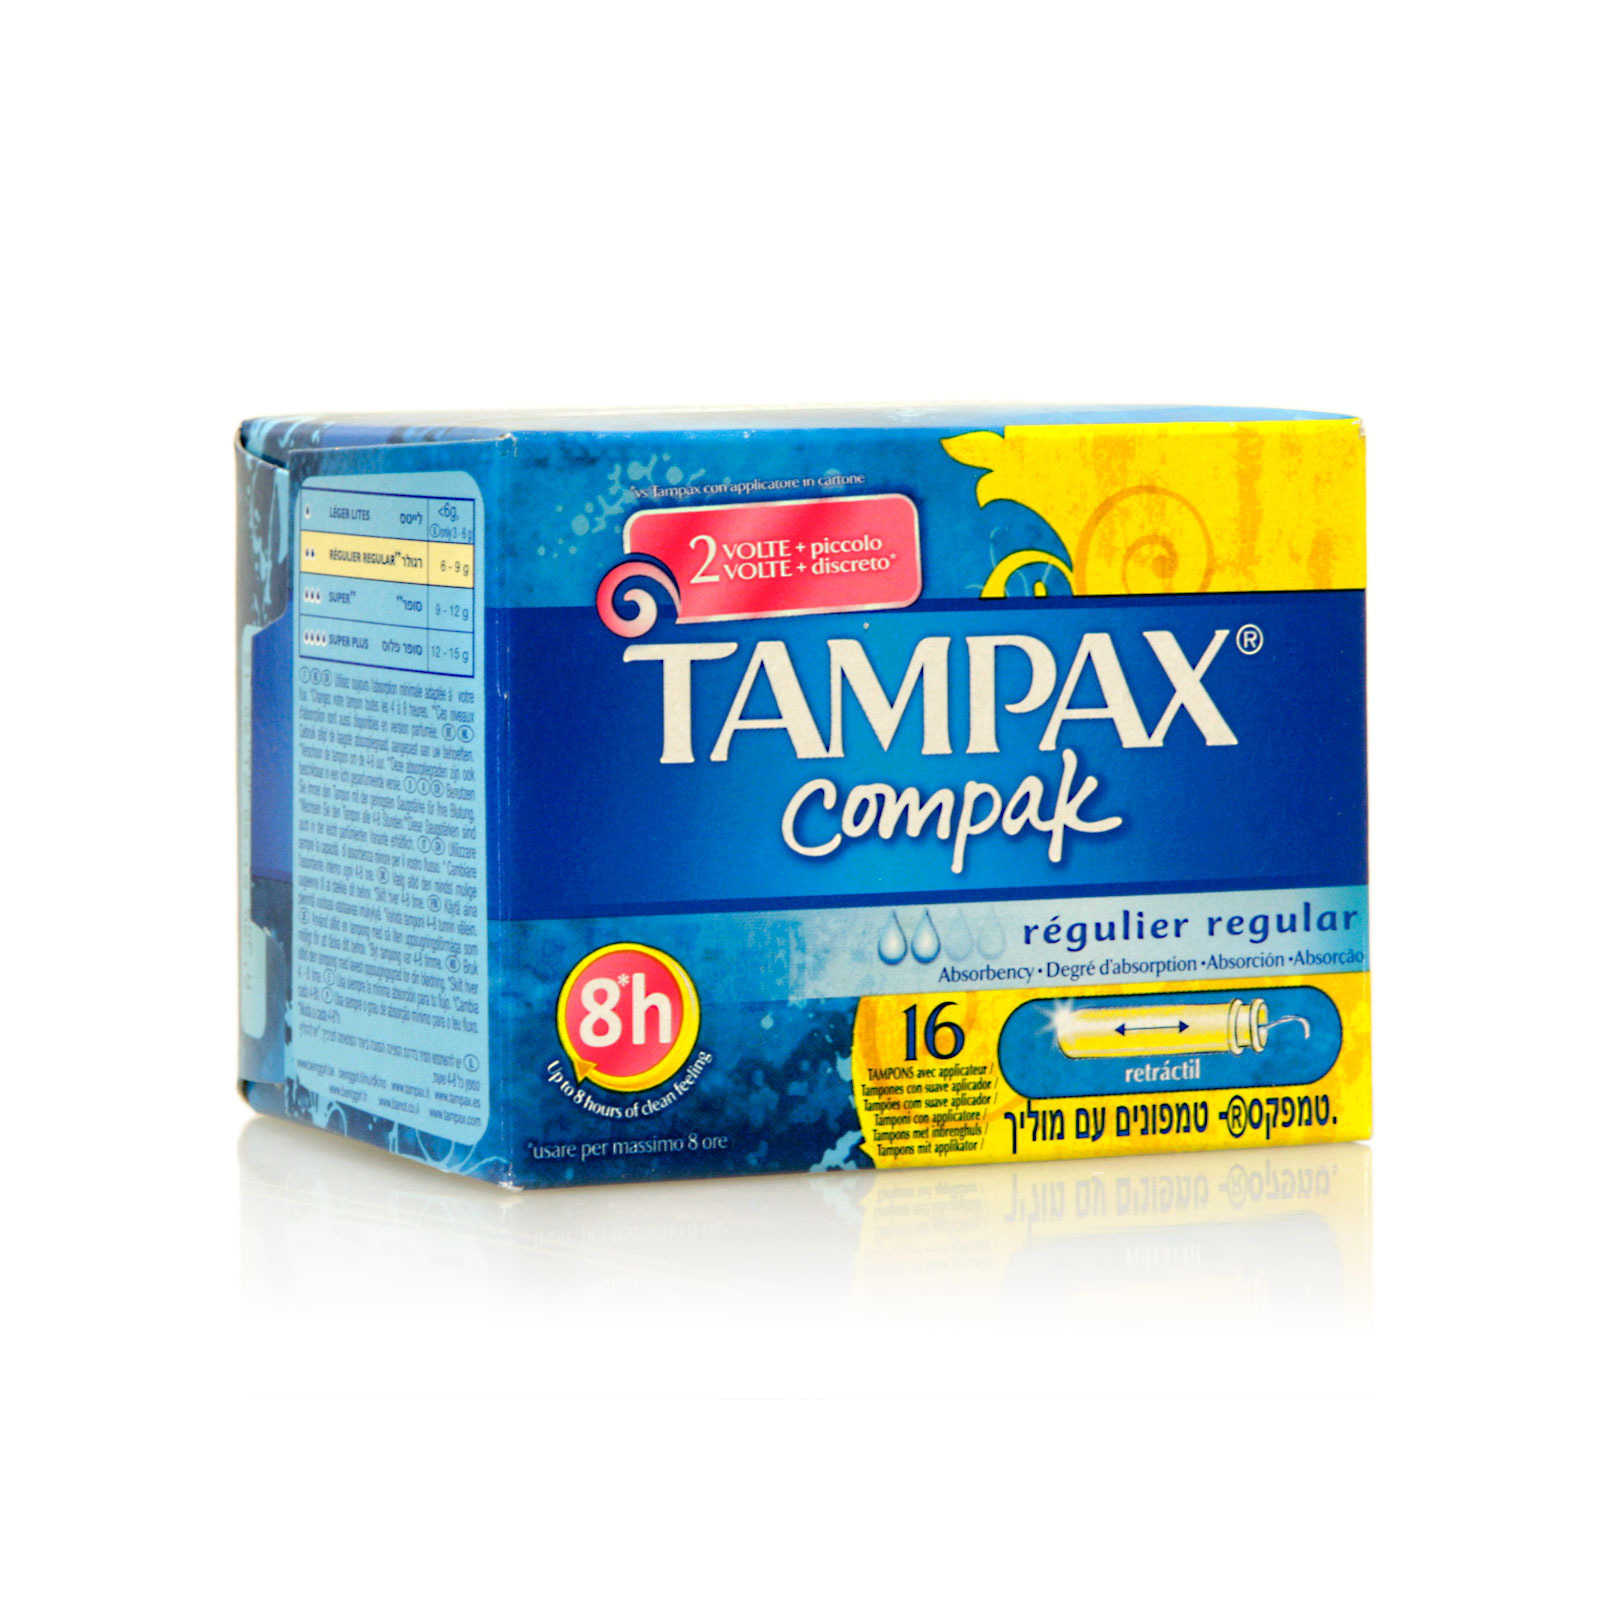 Tampax - Compak - Regular